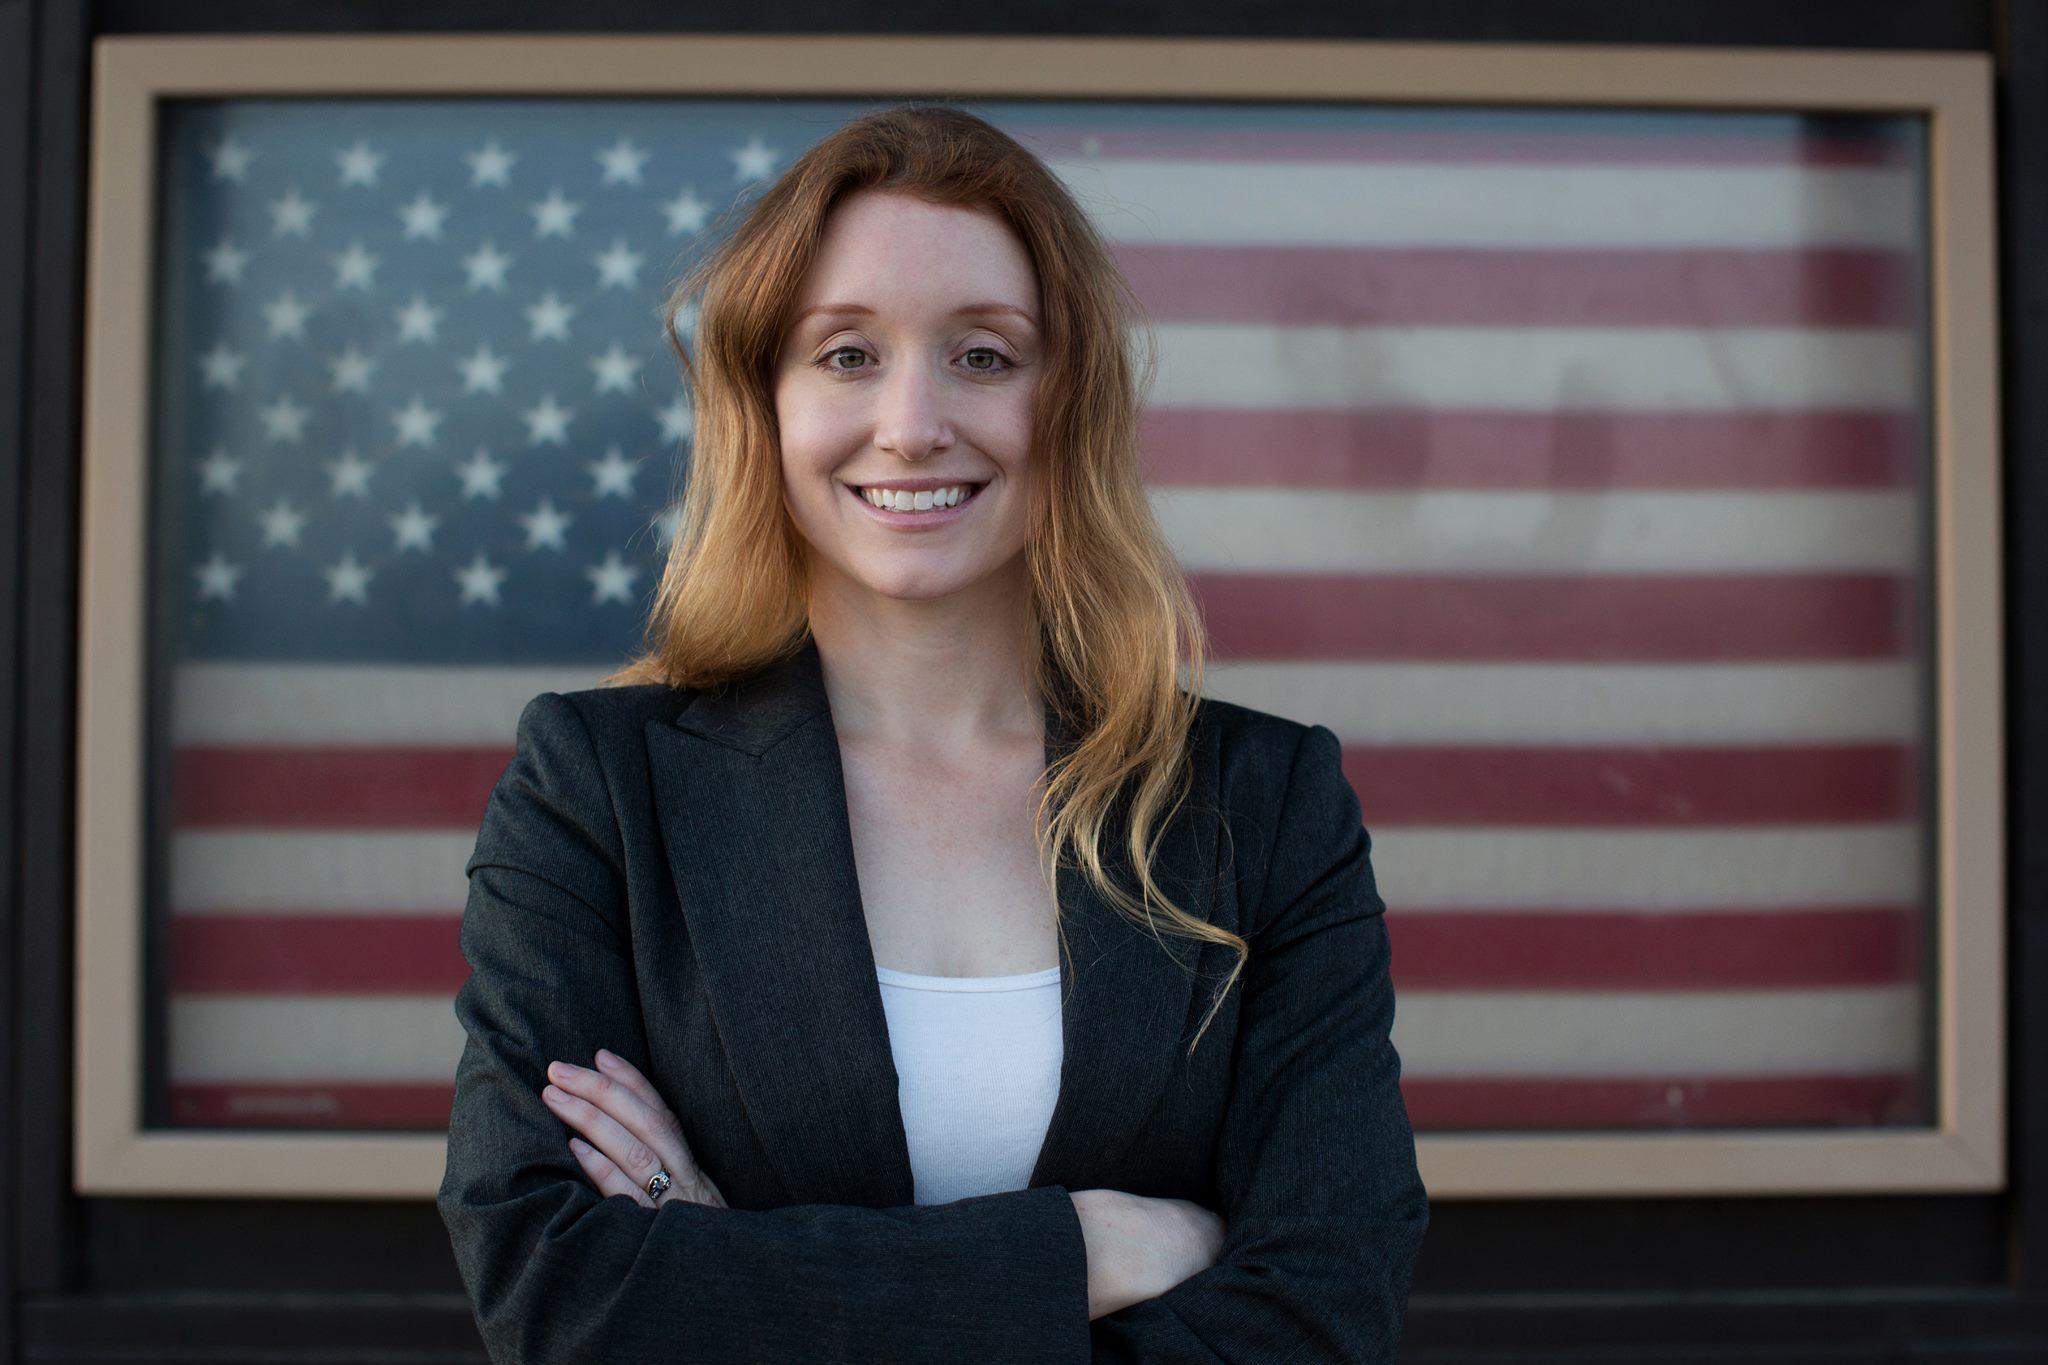 Volcanologist Jess Phoenix Talks Science, Politics and Star Trek Values